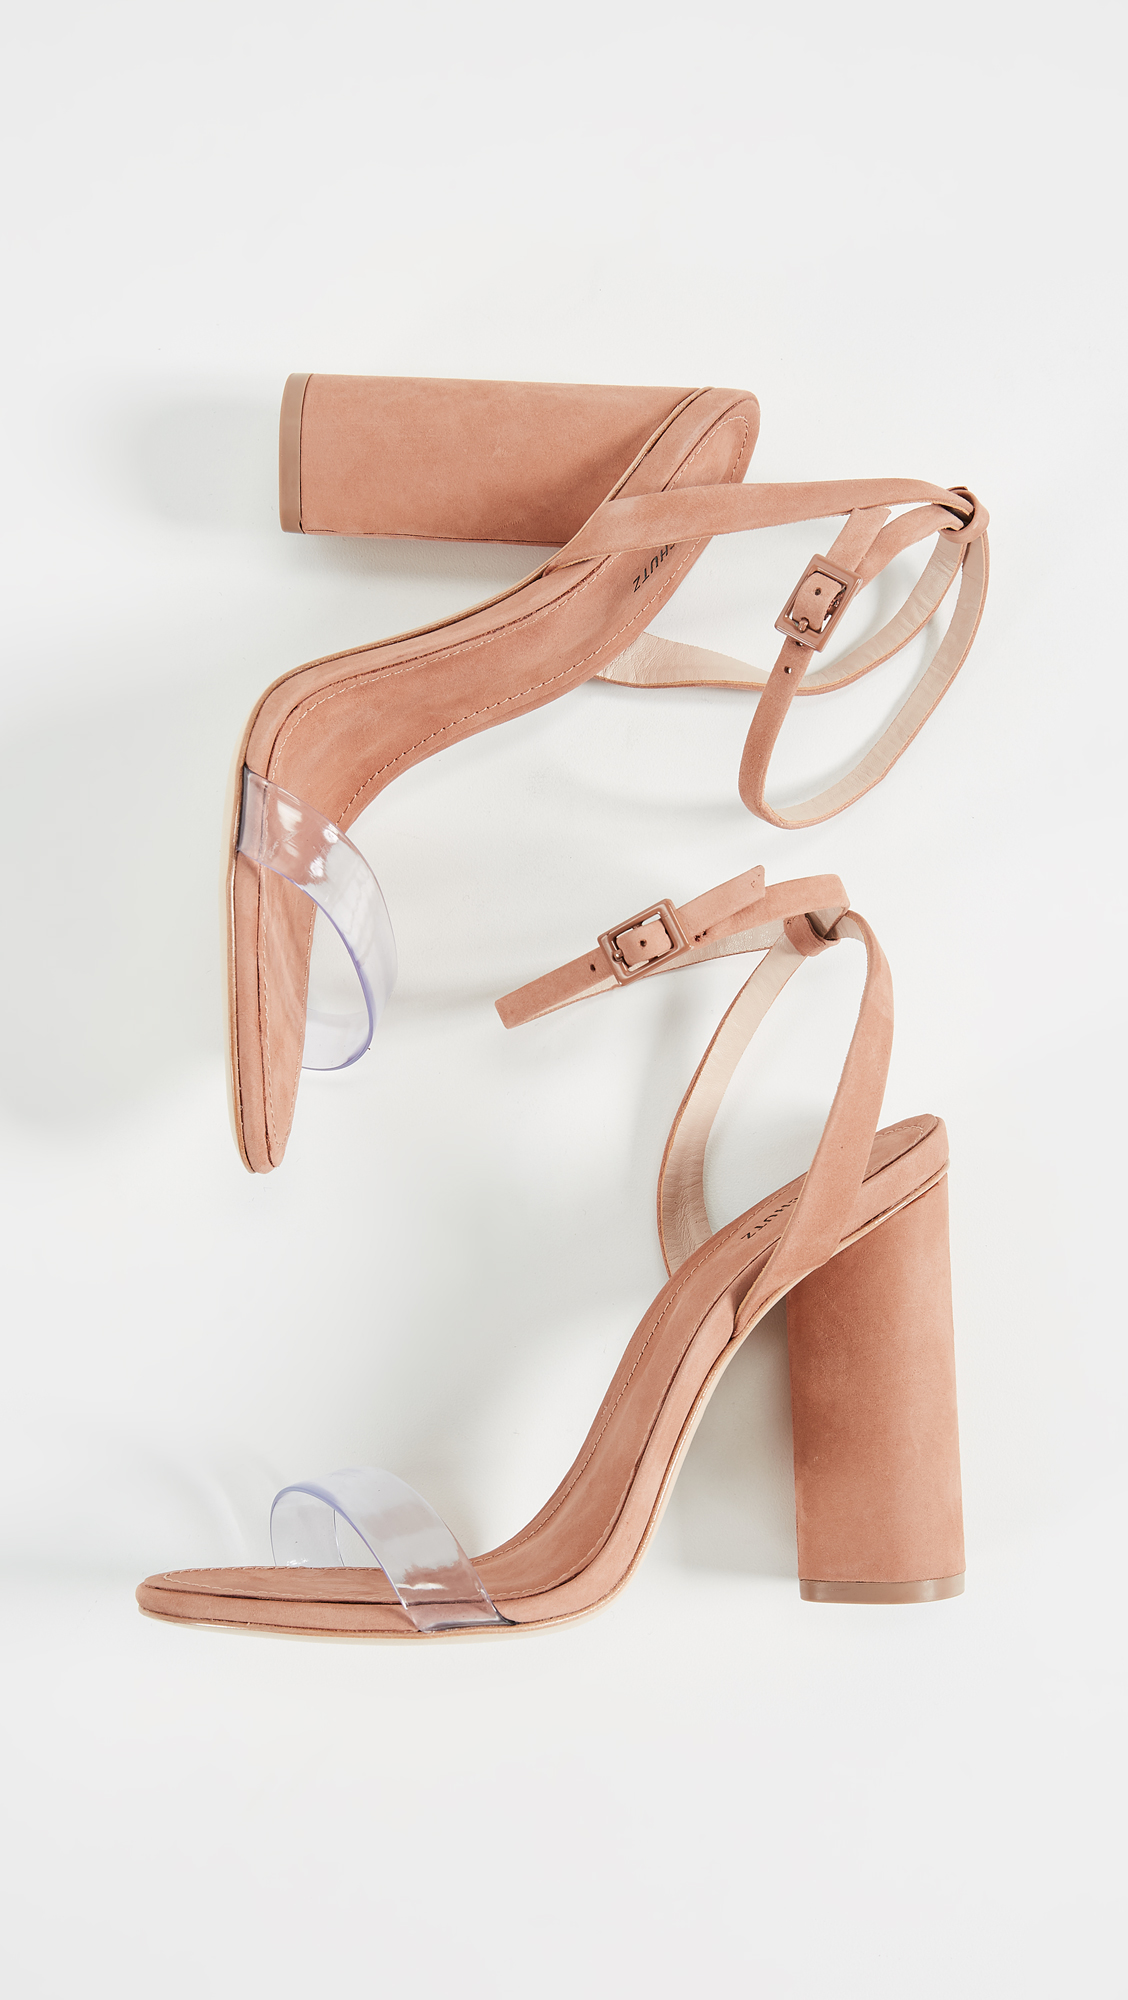 3739f4fbb98e Schutz Geisy PVC Block Heel Sandals